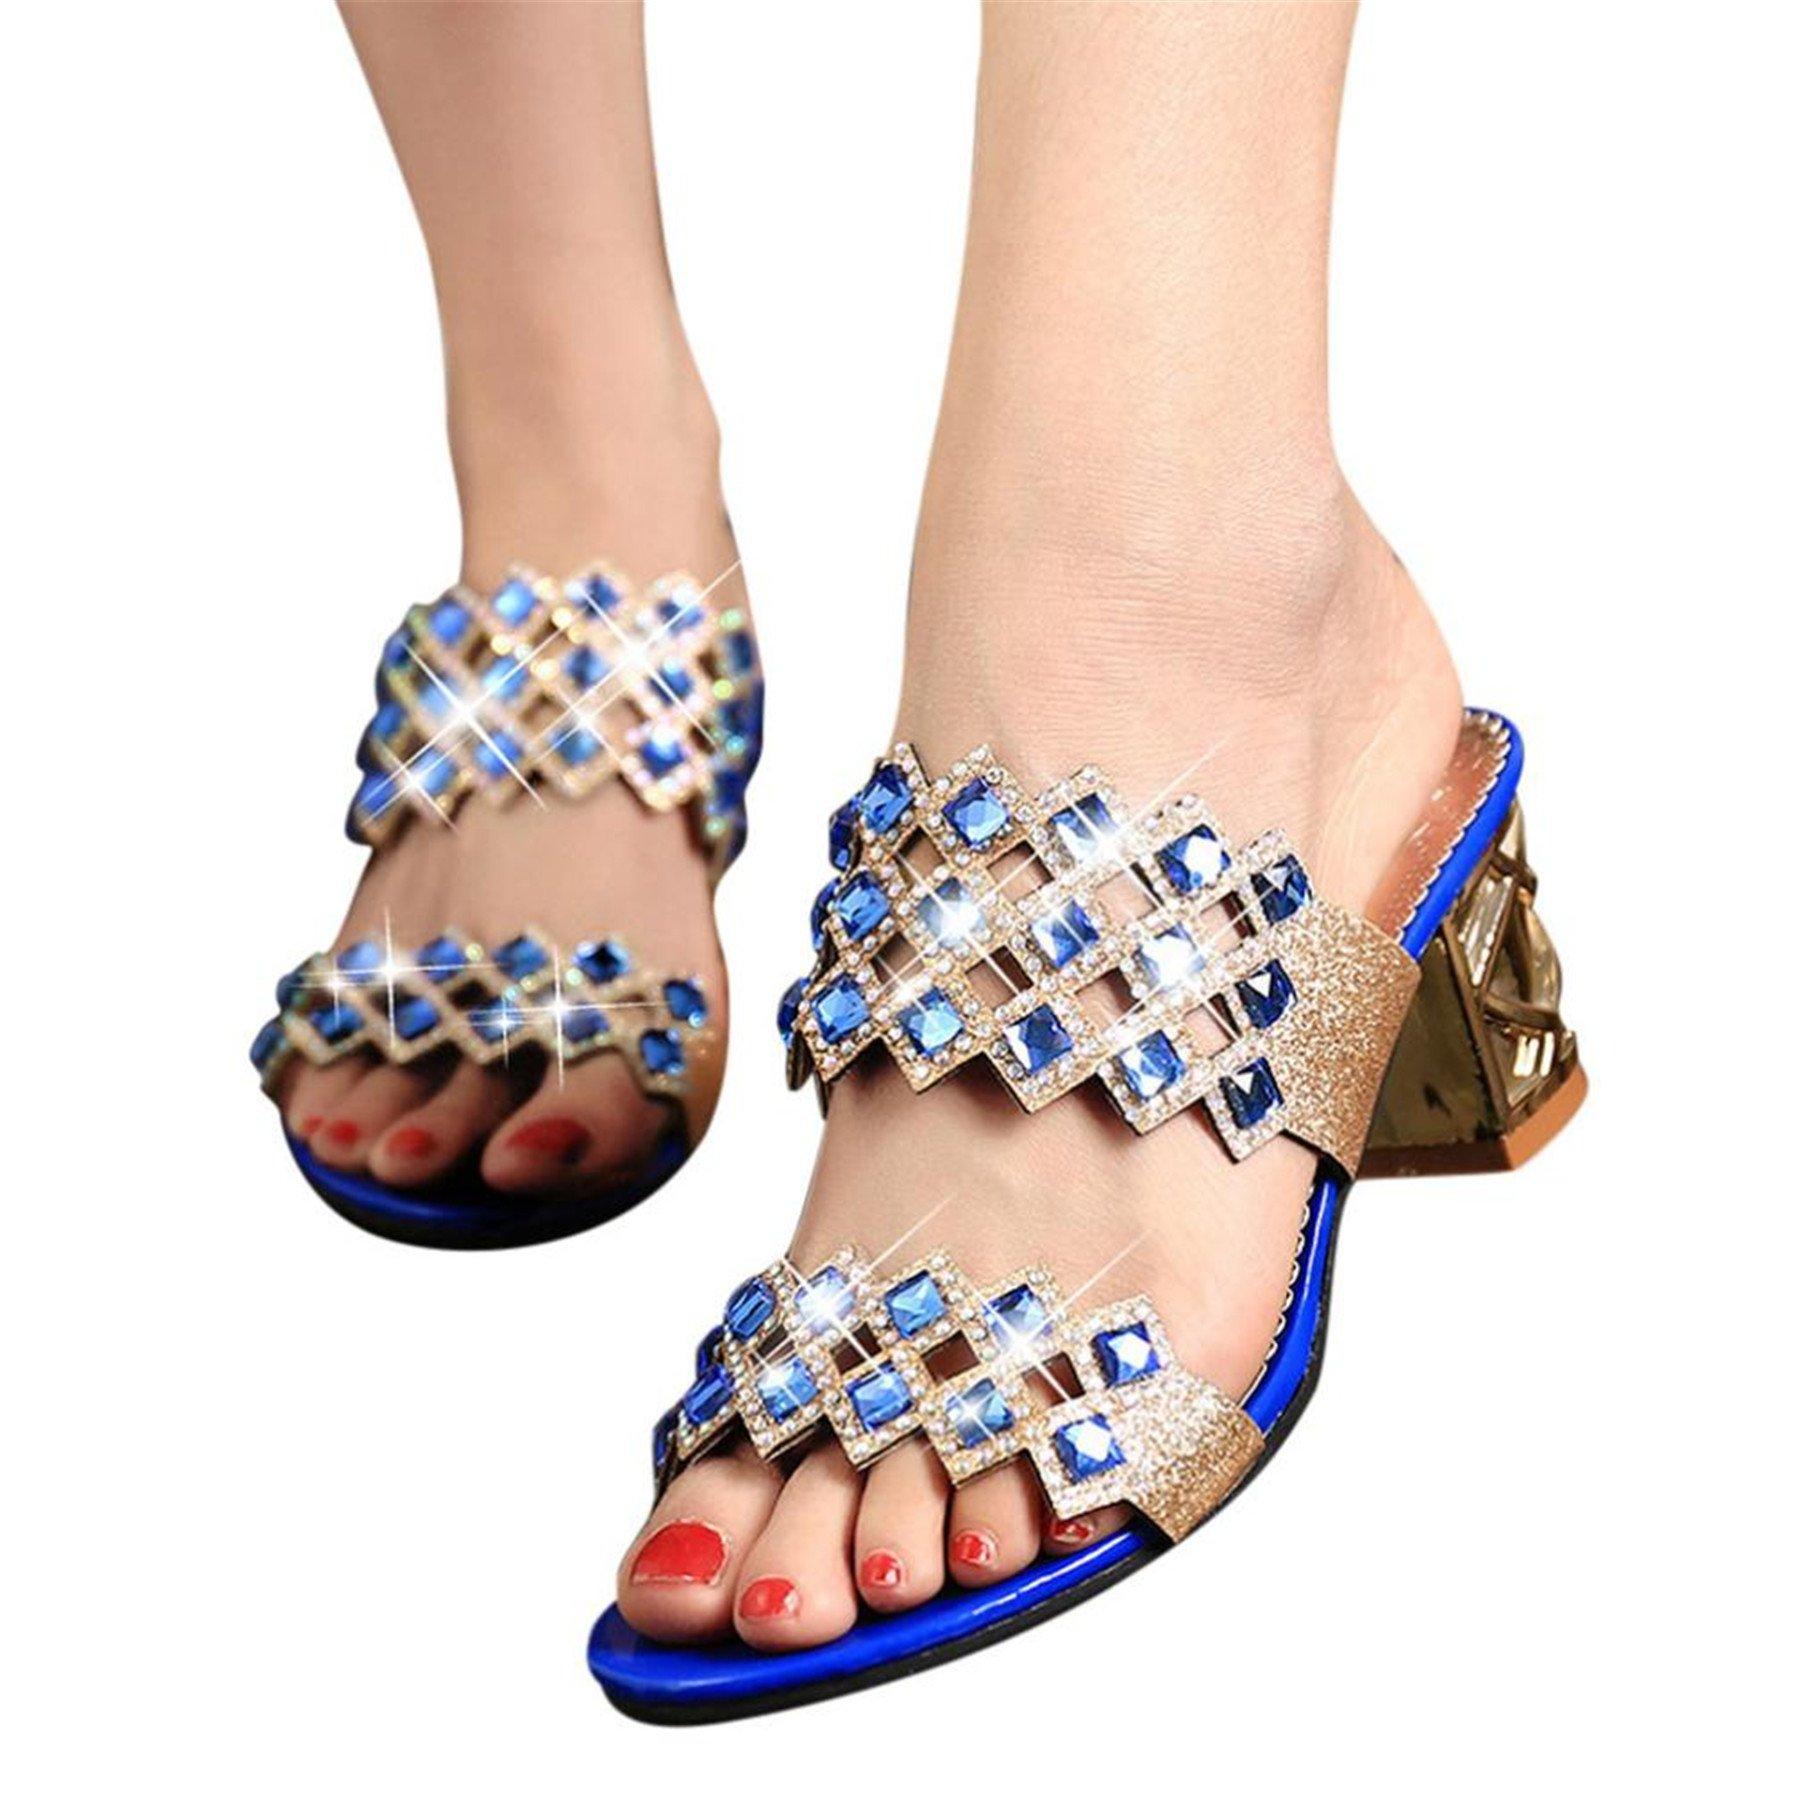 KESEELY Womens Square Heel Sandals, Fashion Women Big Rhinestone High Heel Sandals Ladies Beach Sandal (US:7, Blue)